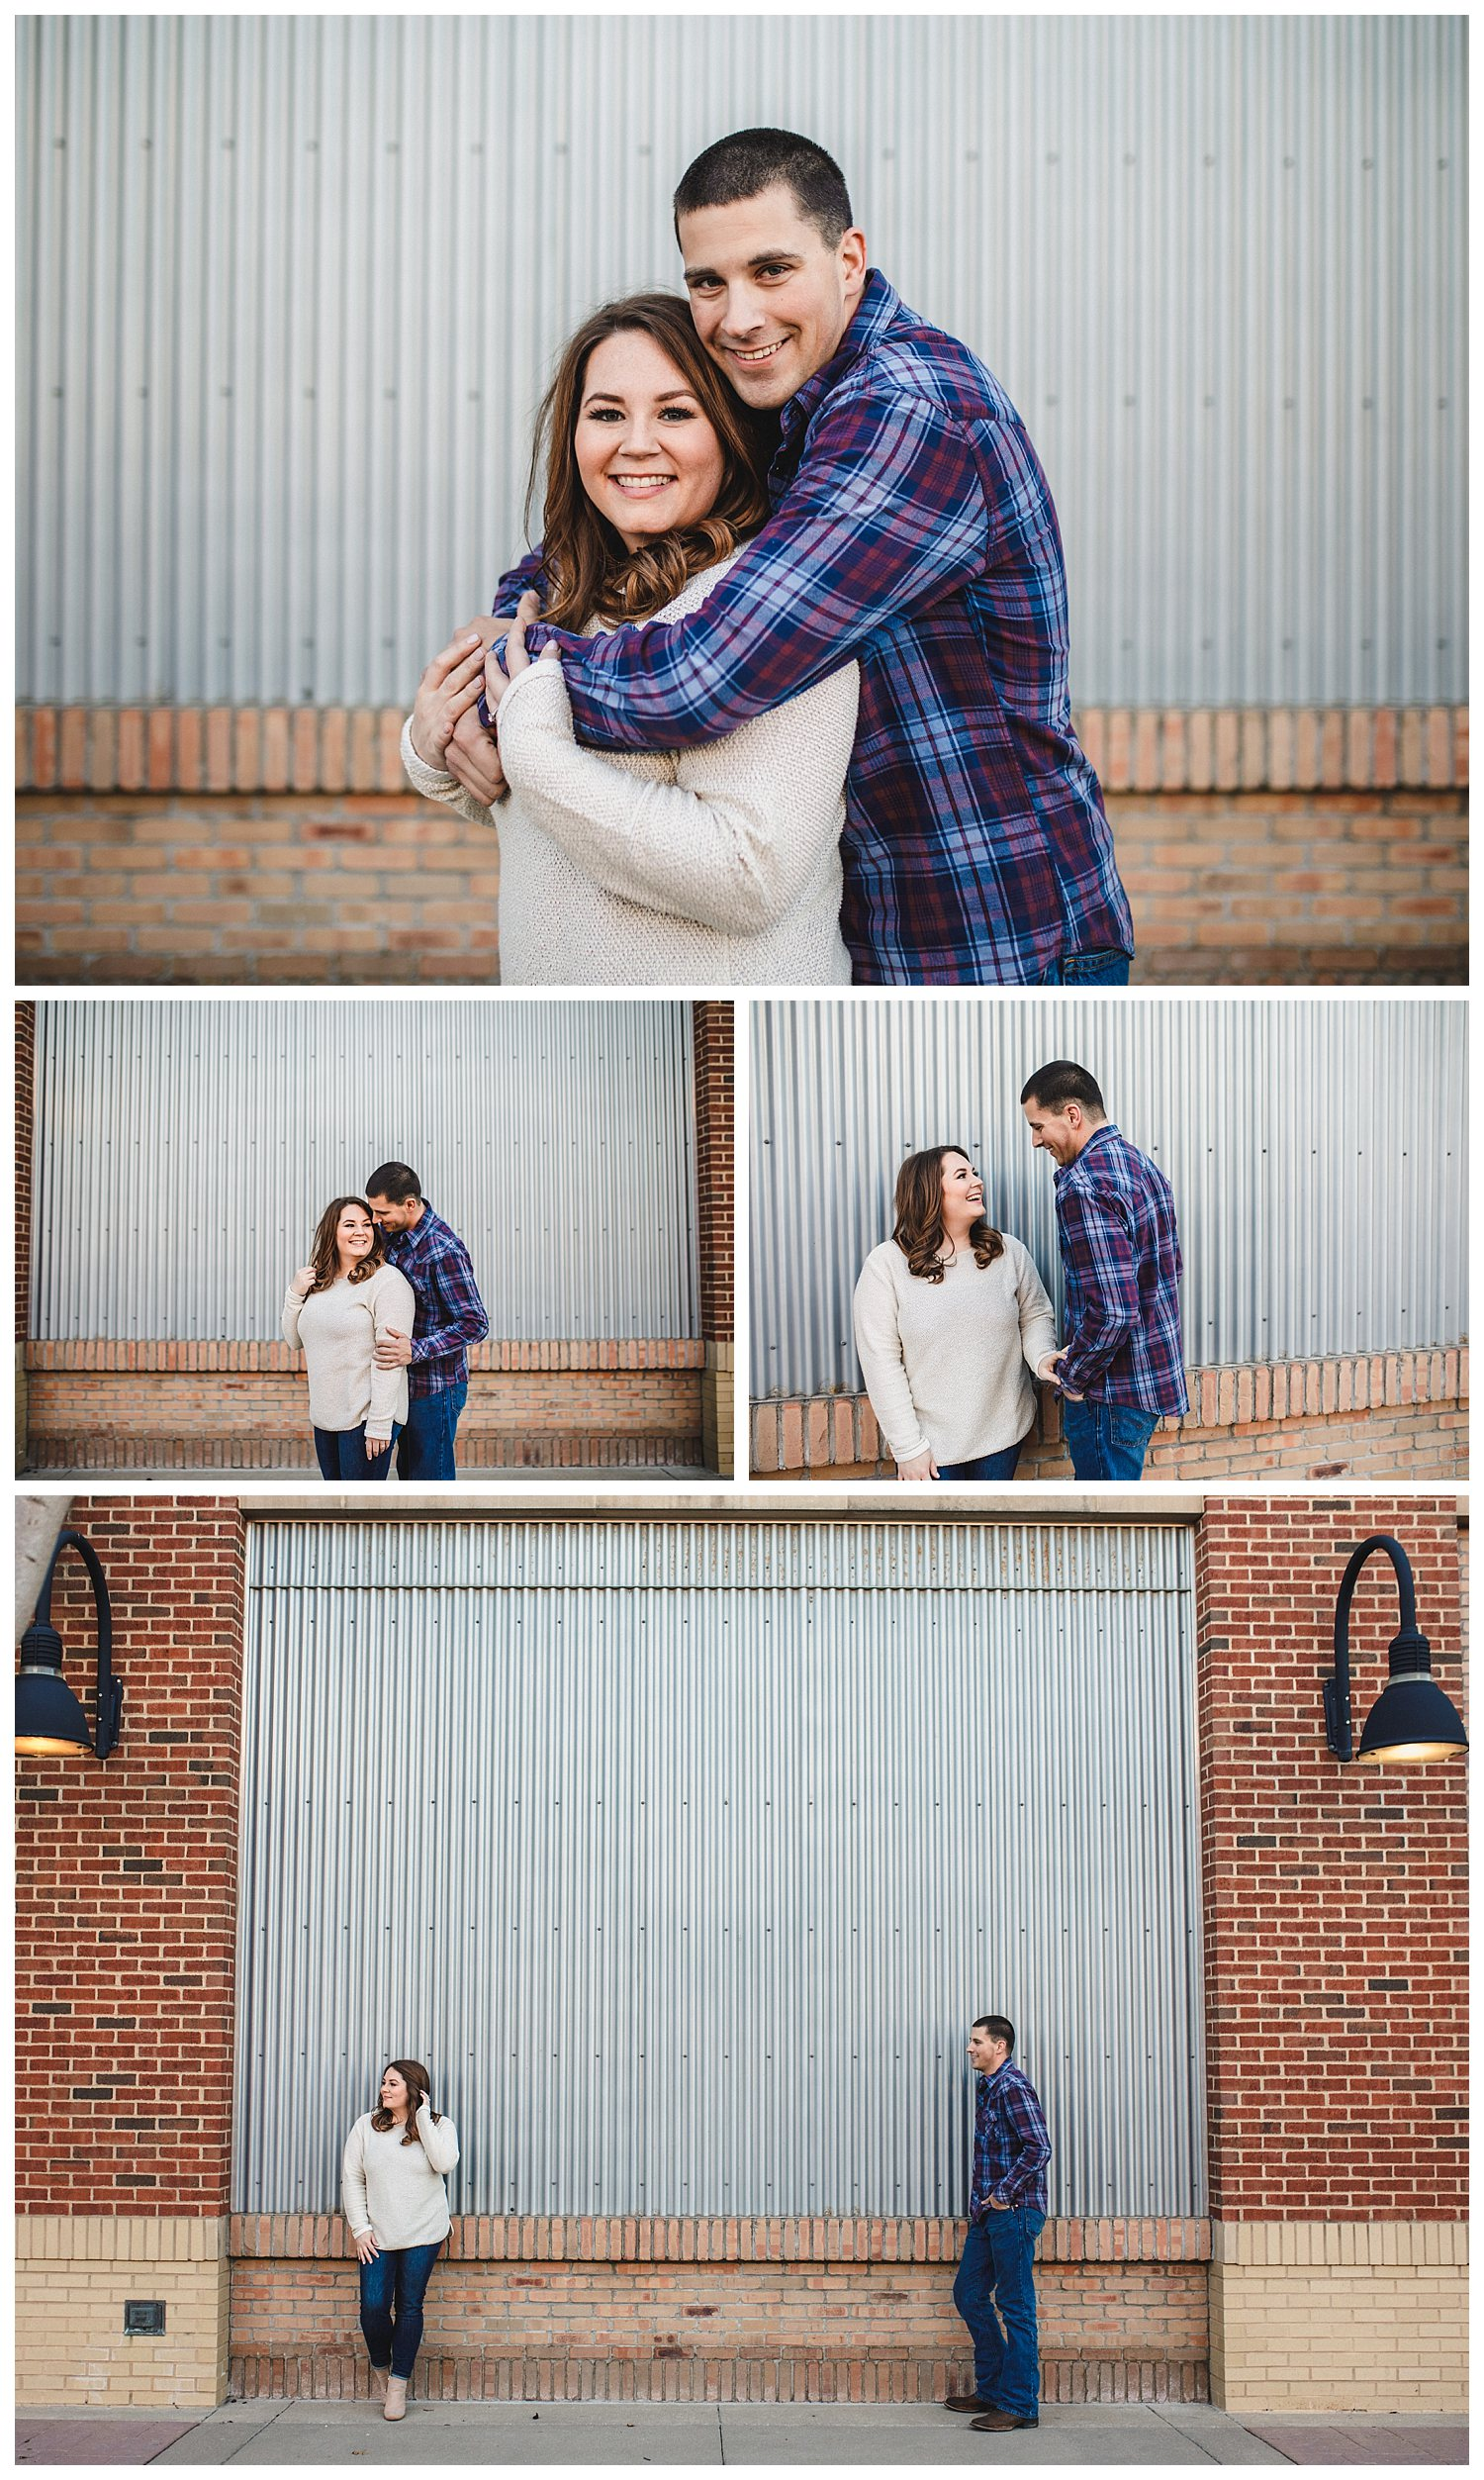 Kelsey_Diane_Photography_T-Bones_Stadium_Kansas_Wandering_Adventourus_Kansas_City_Engagement_0098.jpg